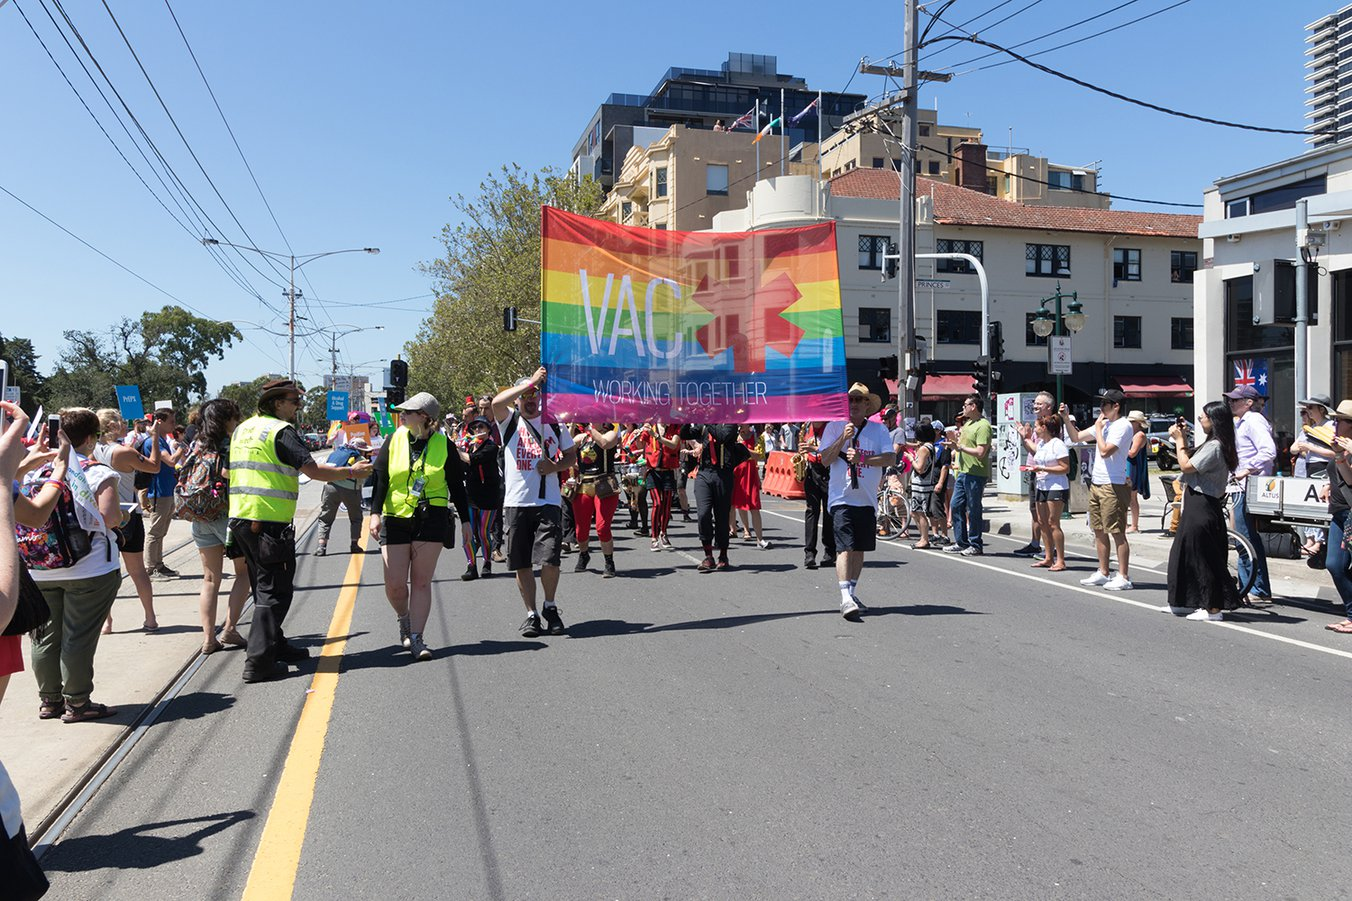 20170202_Pride March_Paul Rees_RE-SIZED_019.jpg